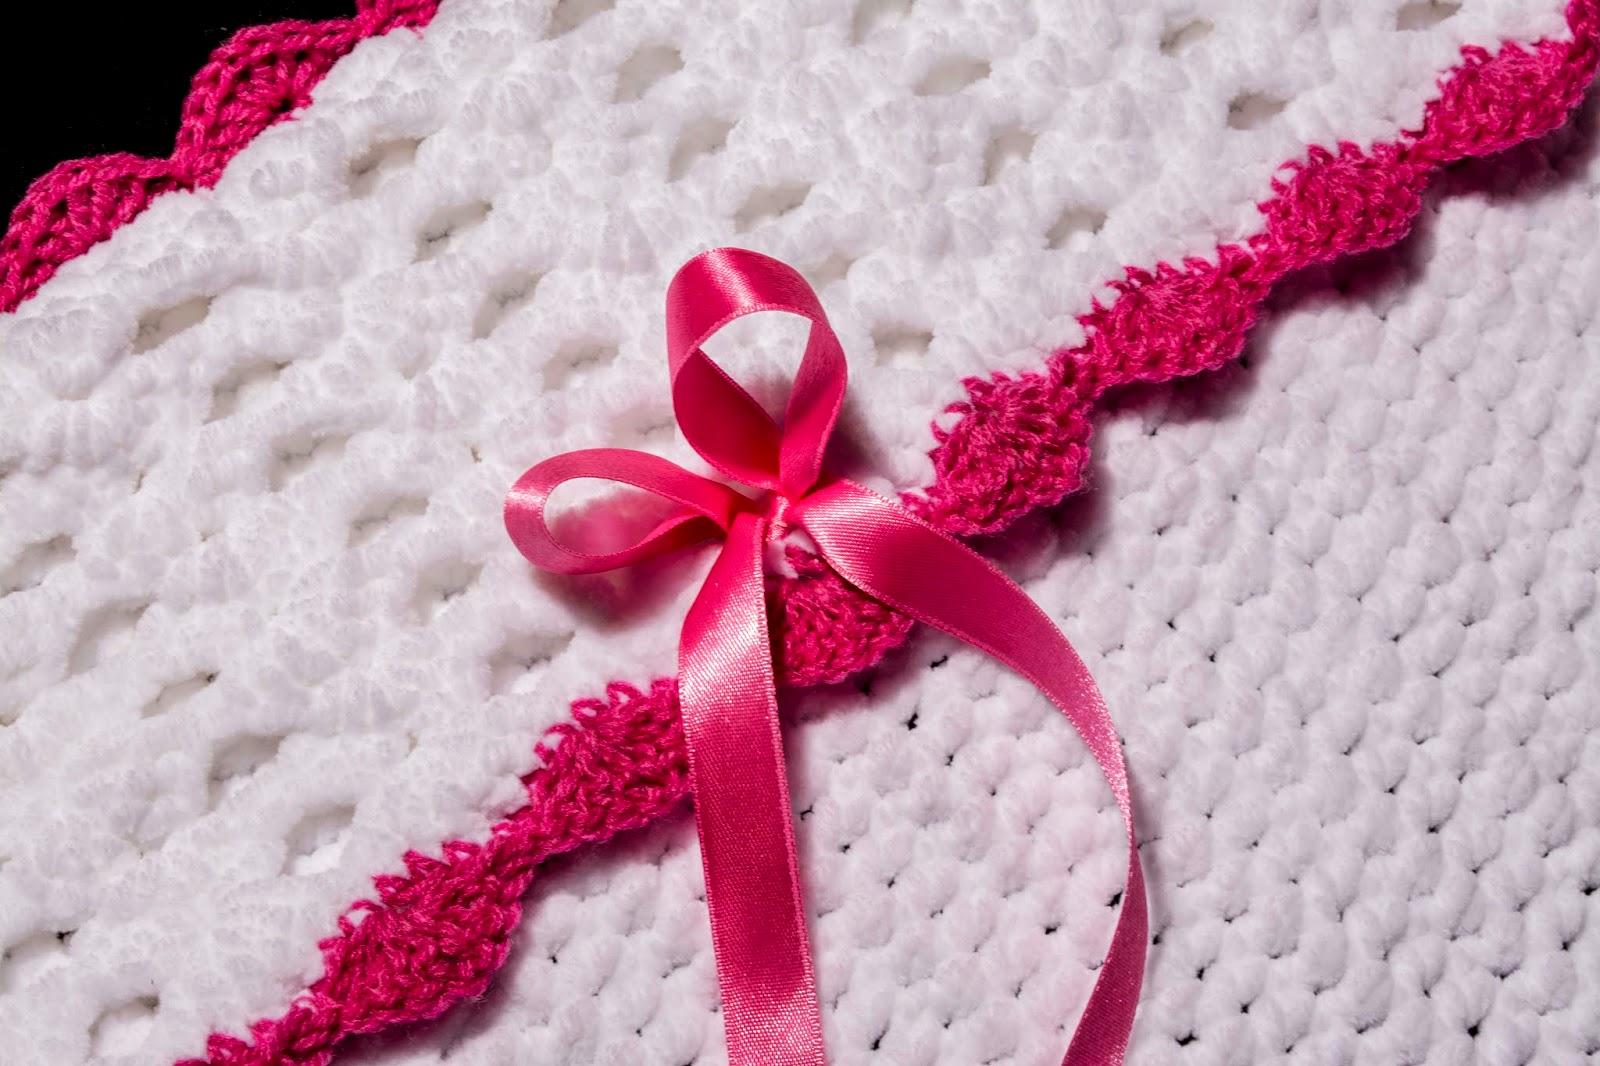 James brett yarn,flutterby,baby,chunky,blanket,handmade,crochet,cuddly,gifts,christening